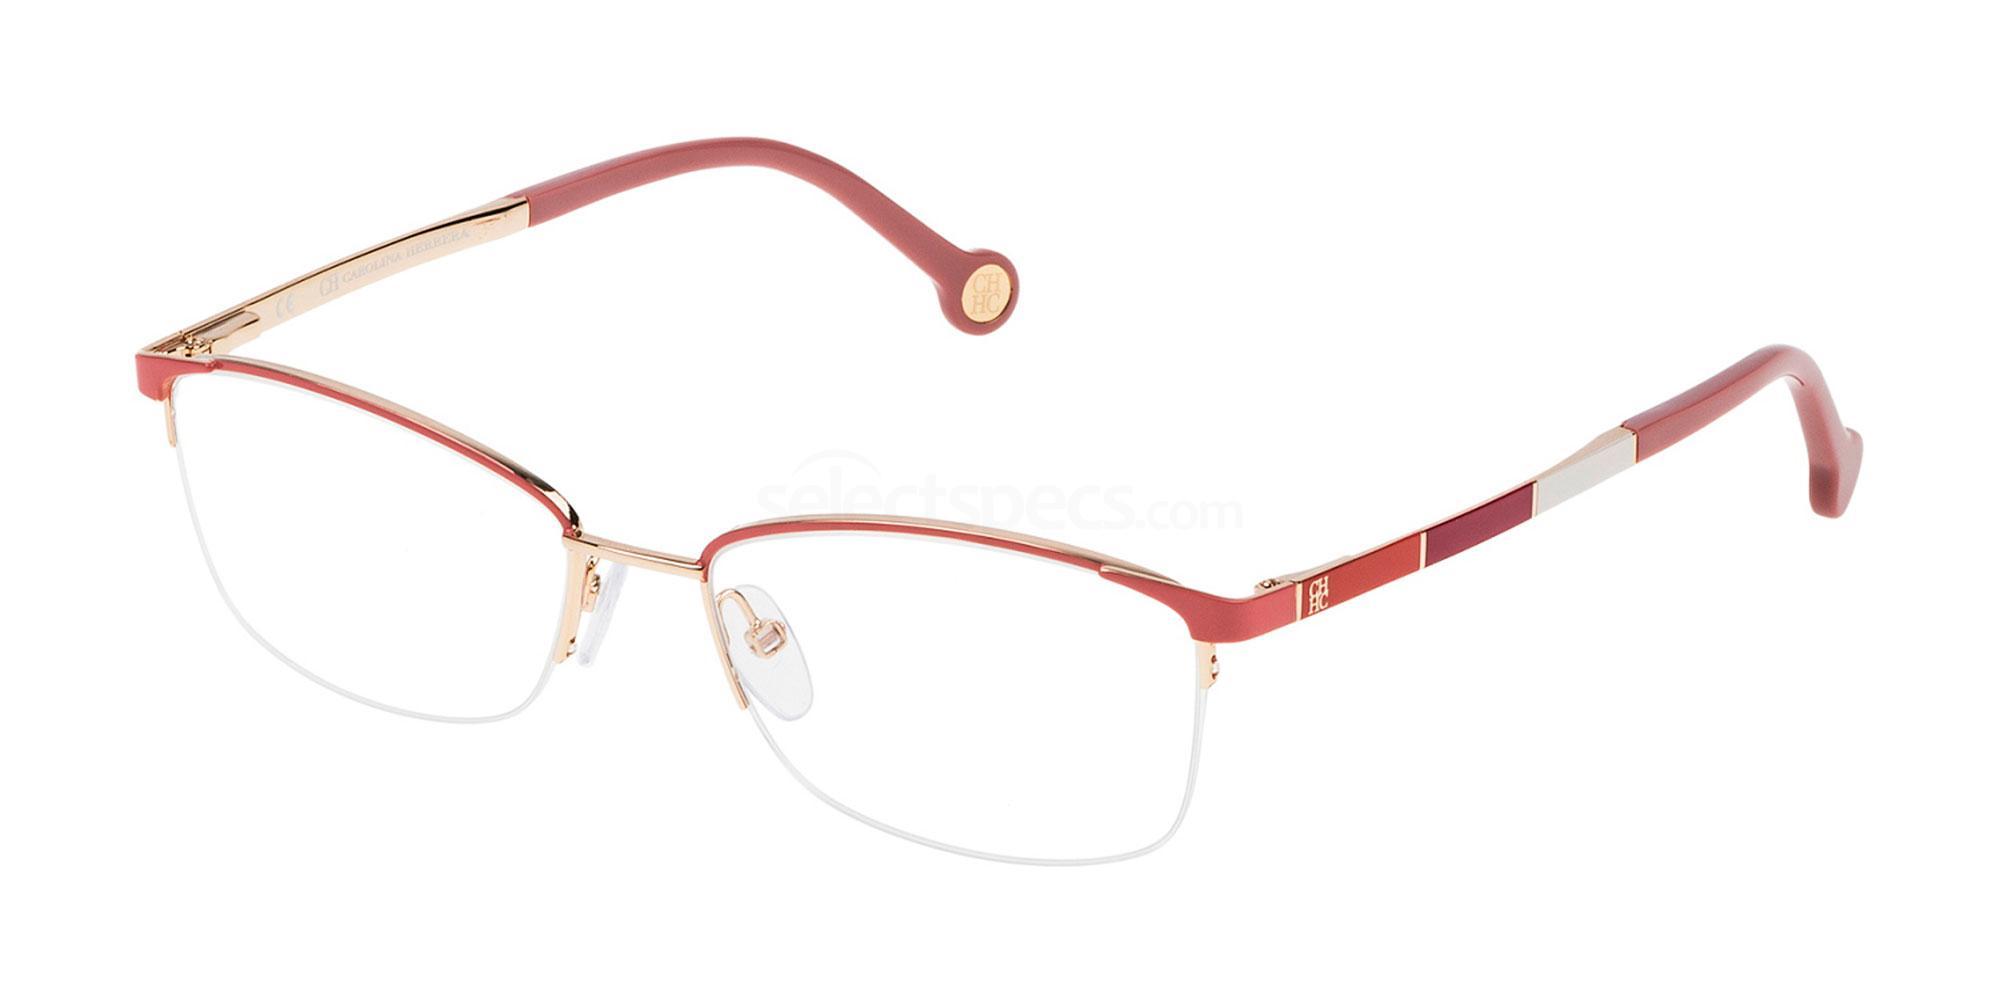 0323 VHE077 Glasses, CH Carolina Herrera